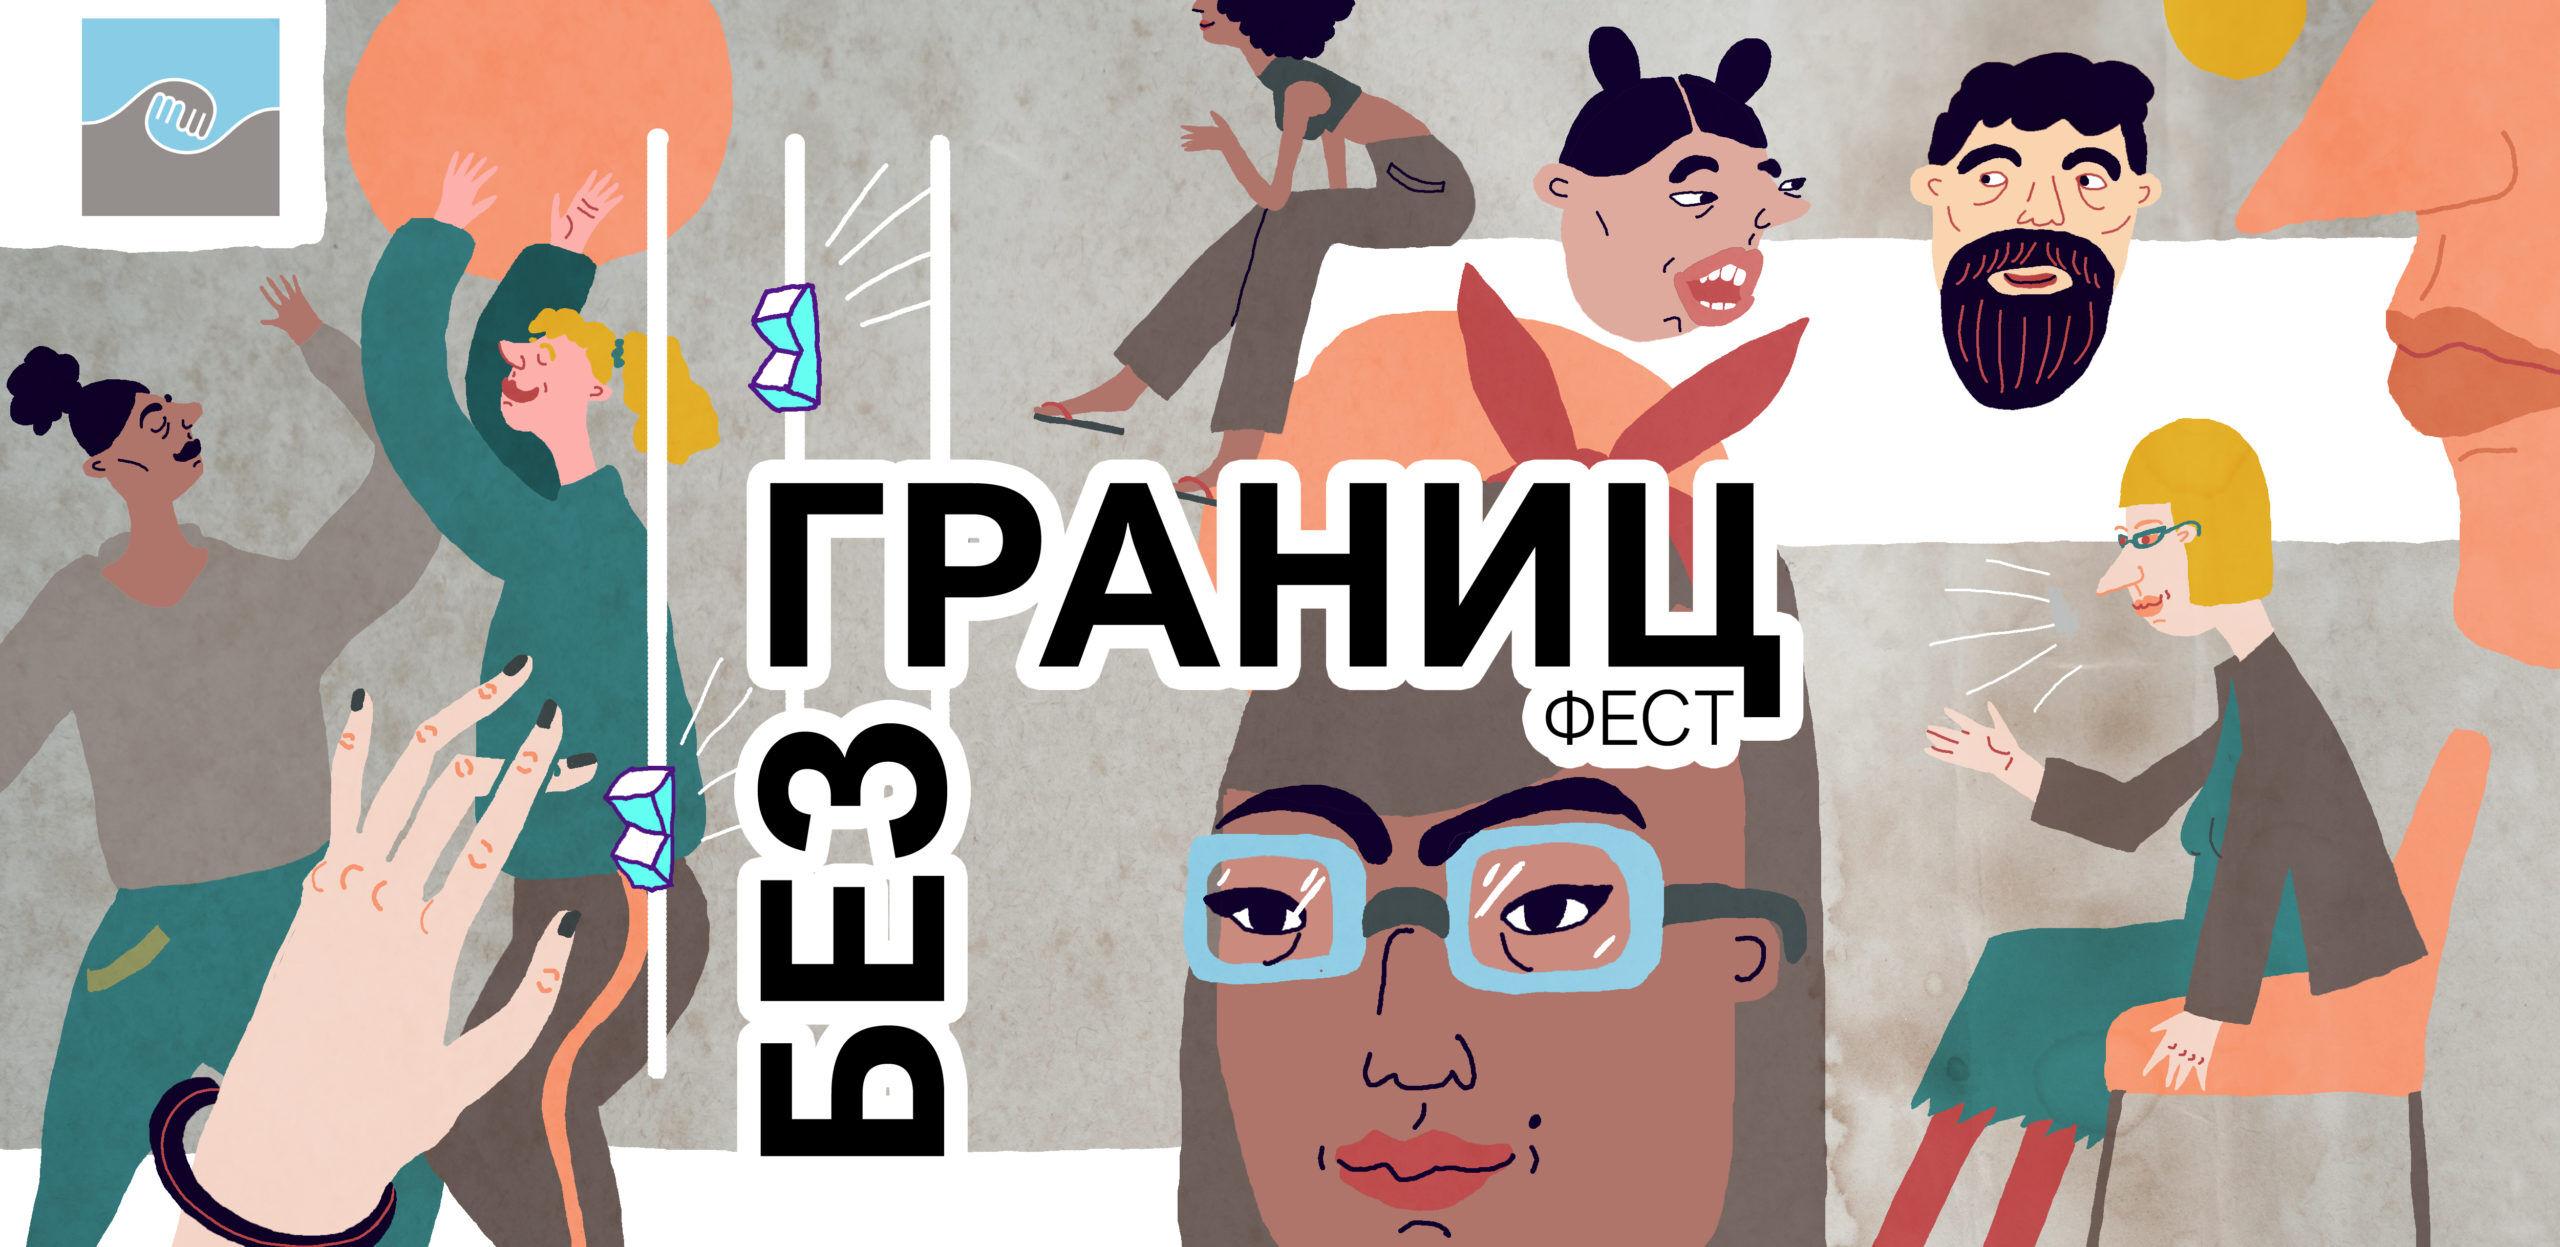 20-21 июня онлайн-фестиваль «Без Границ»